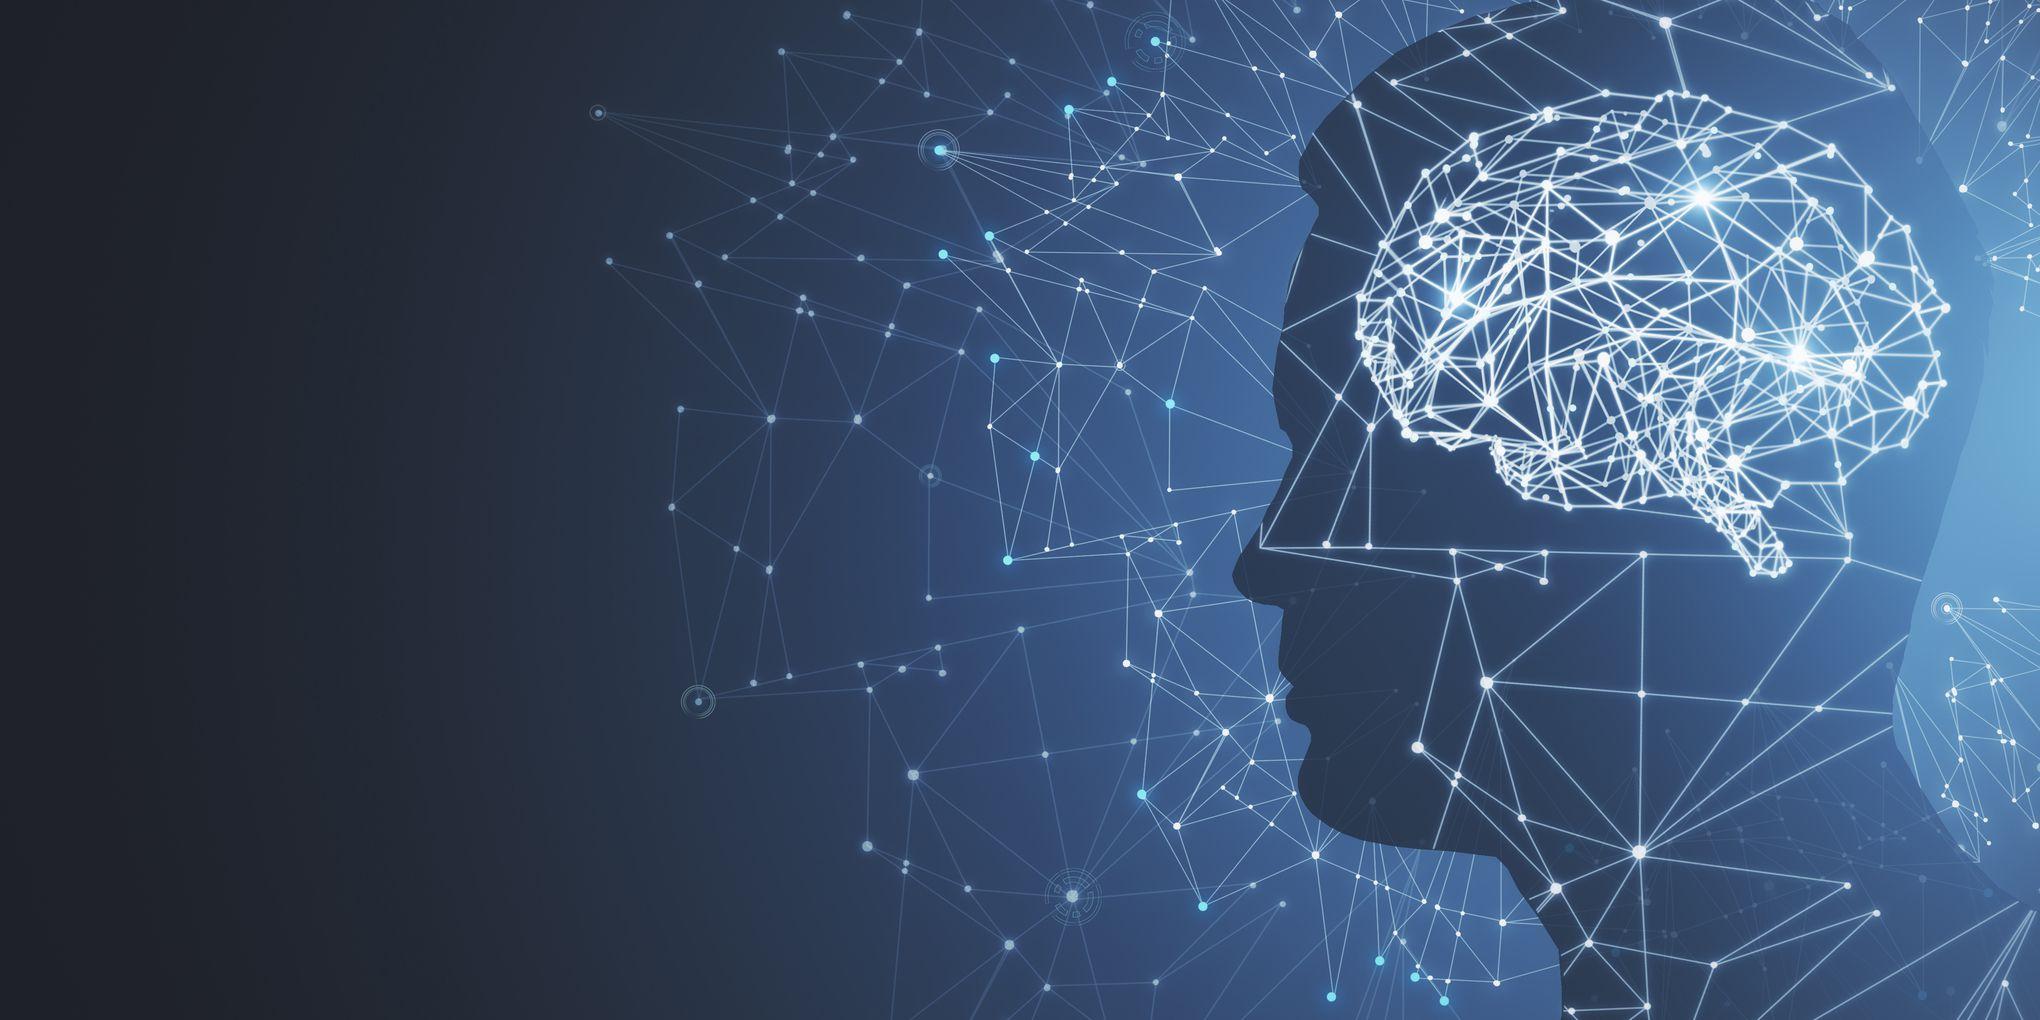 internetska stranica za upoznavanje duševna bolest